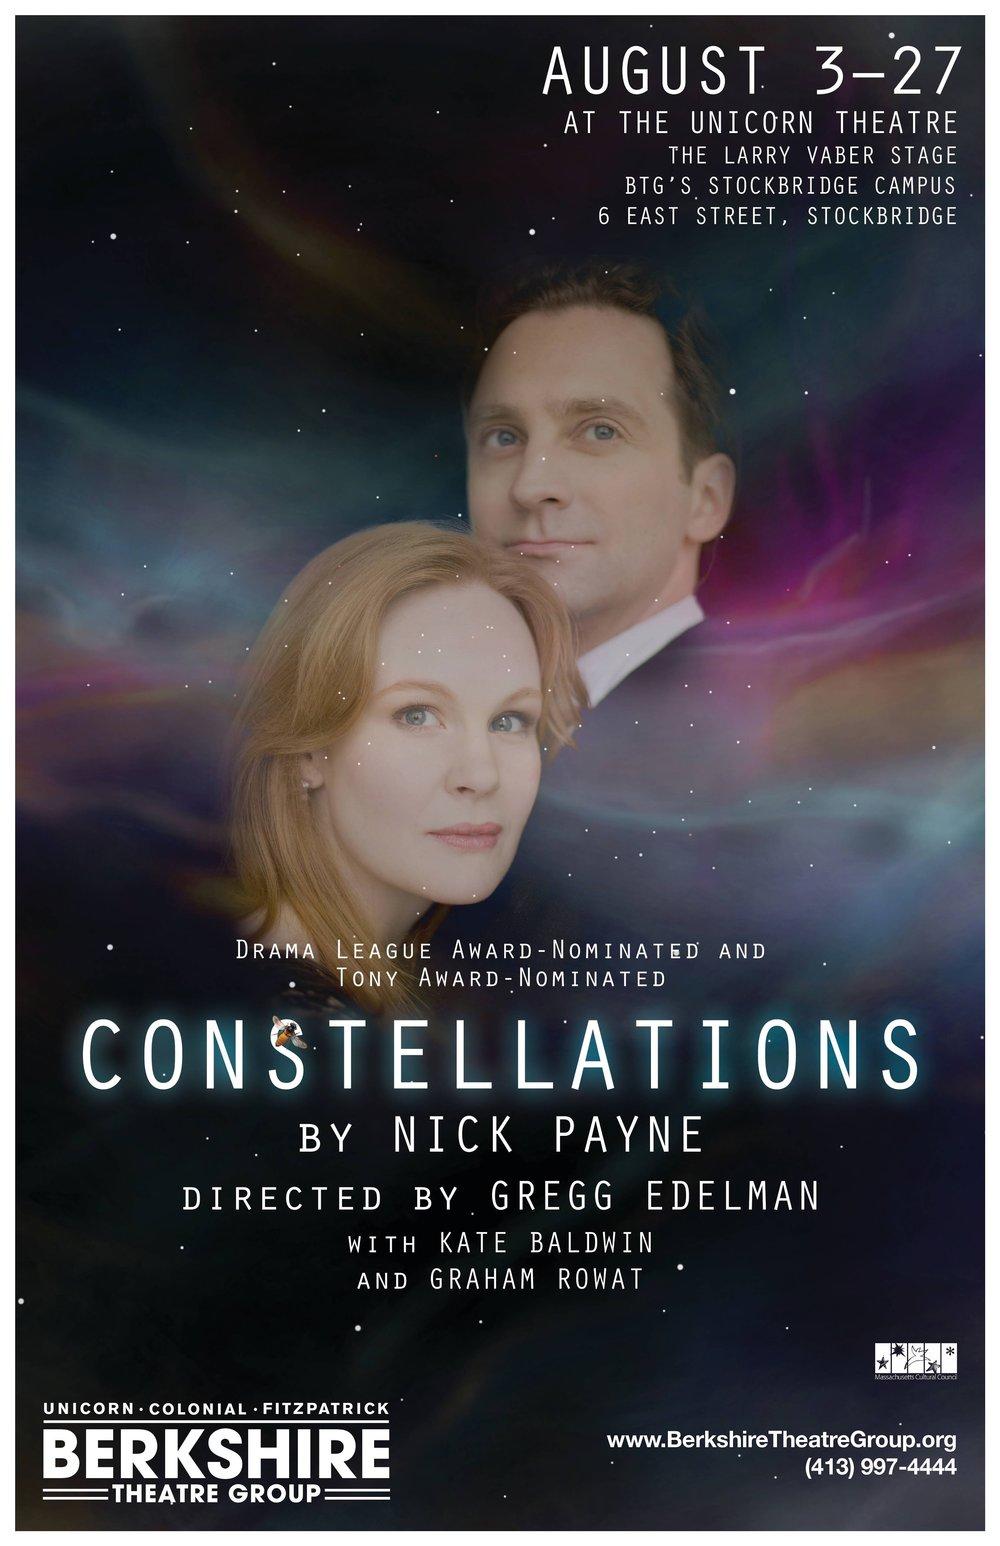 Constellations Poster Vert.JPG